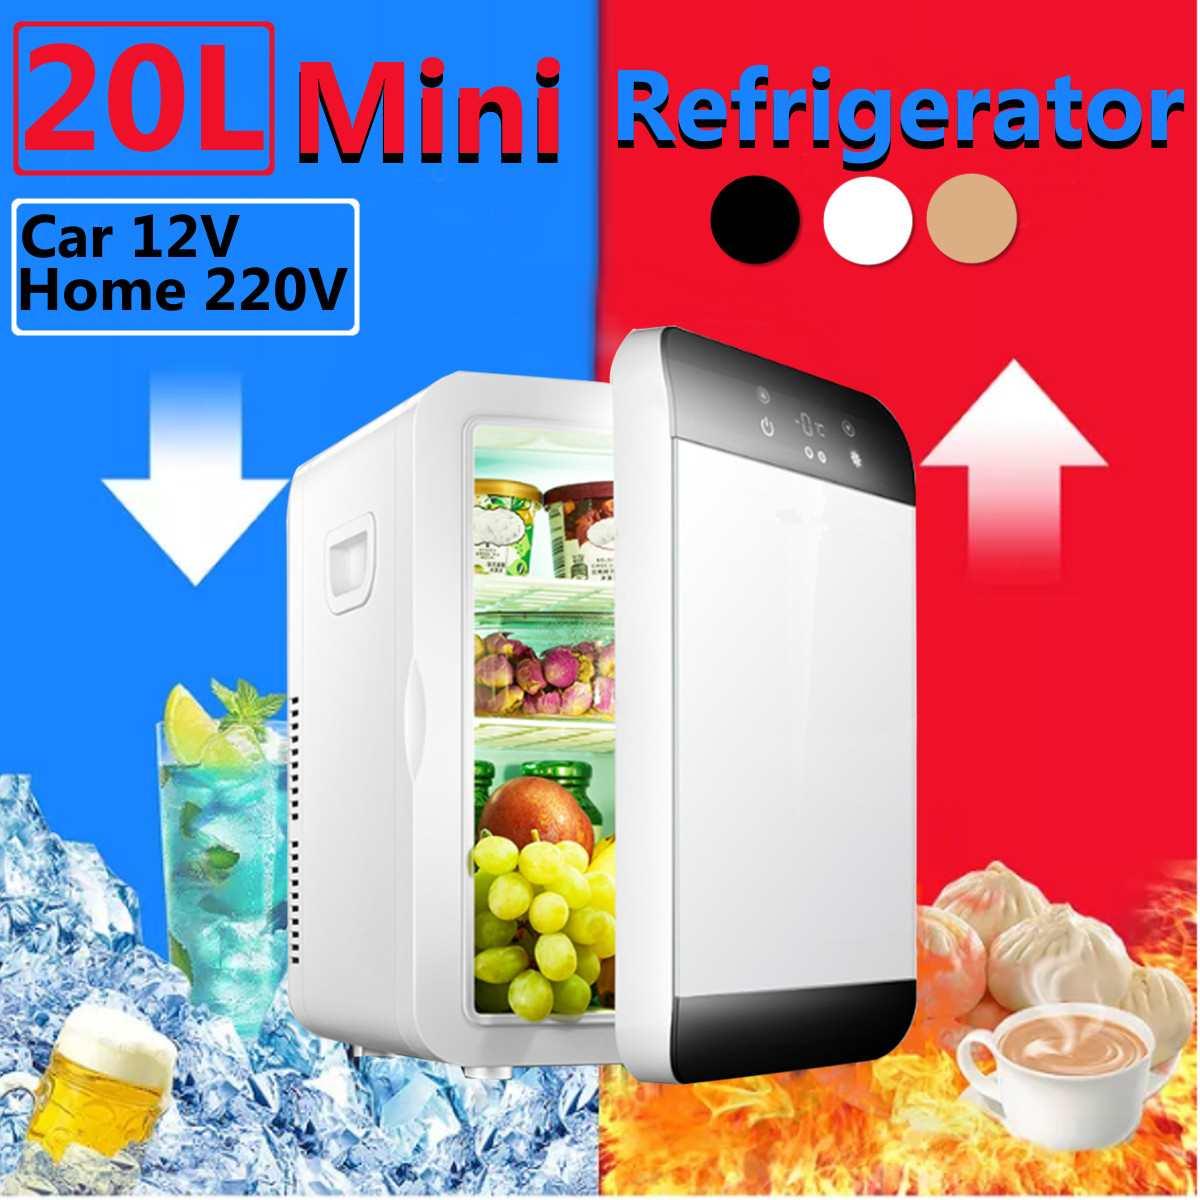 20L Freezer Fridge Dual Refrigerator Home Dual Use Cold Fridge Cooler Universal Vehicle Parts